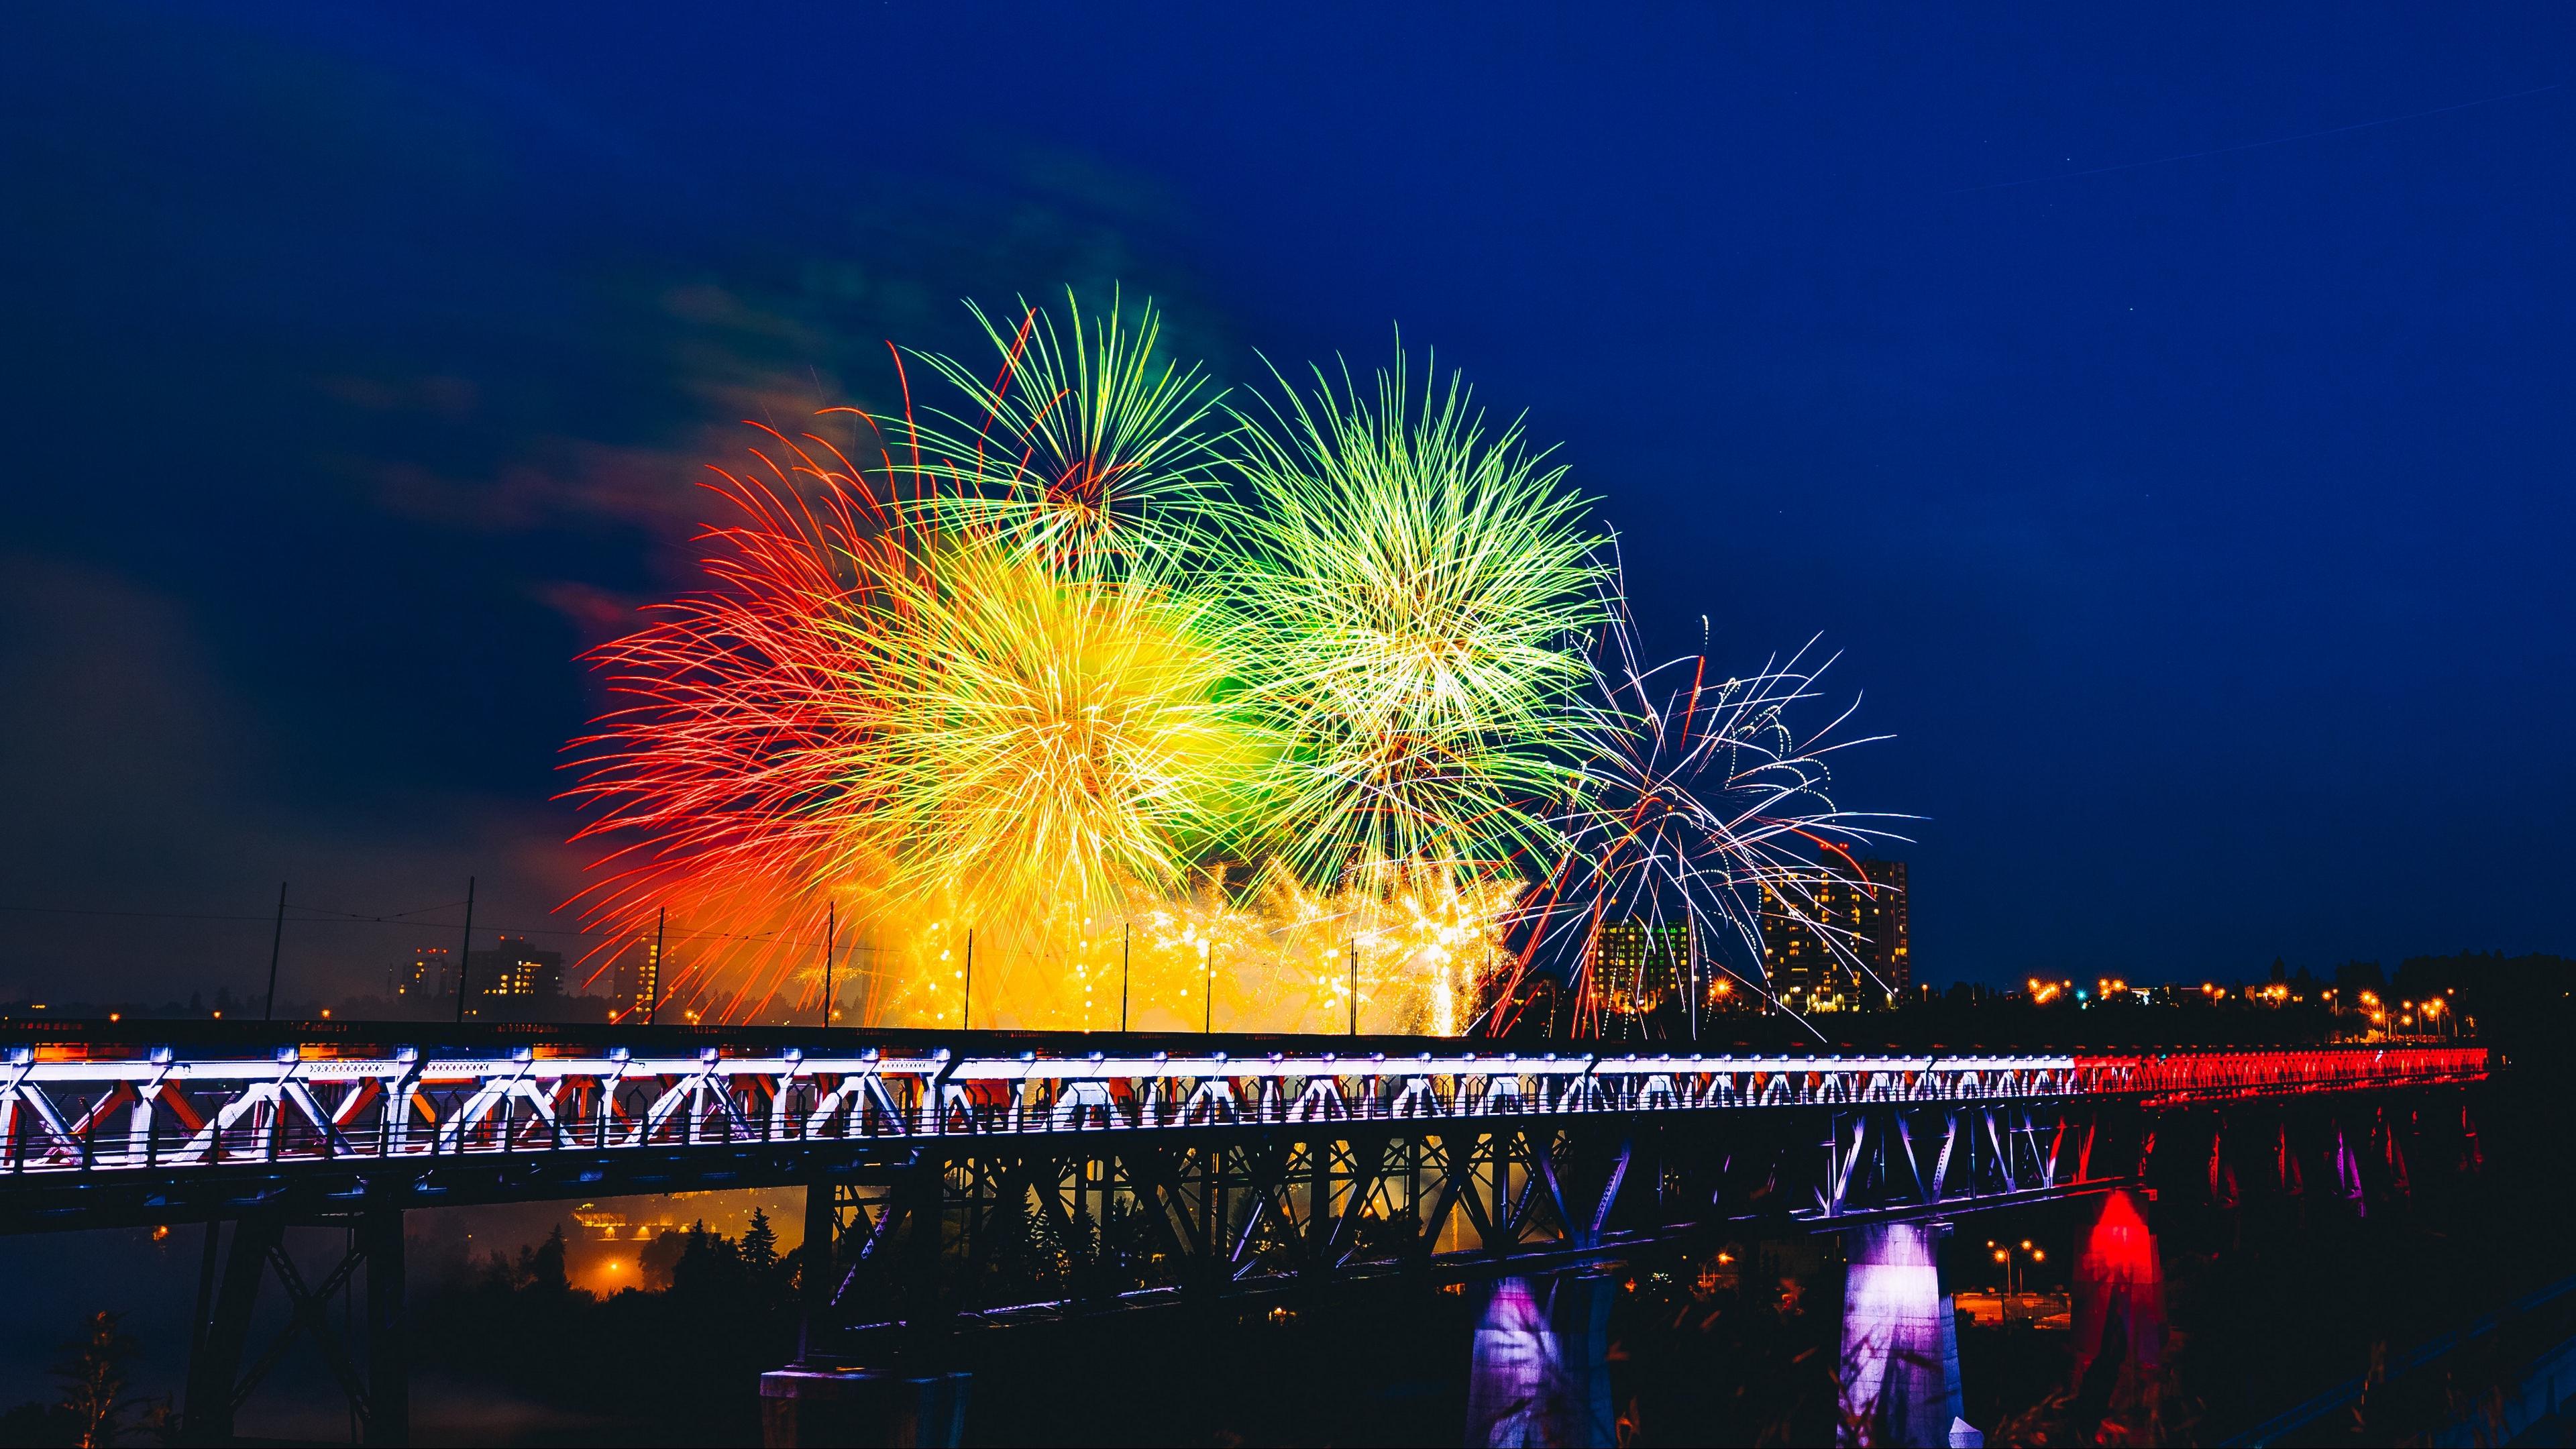 fireworks bridge holiday colorful 4k 1538345169 - fireworks, bridge, holiday, colorful 4k - Holiday, Fireworks, bridge